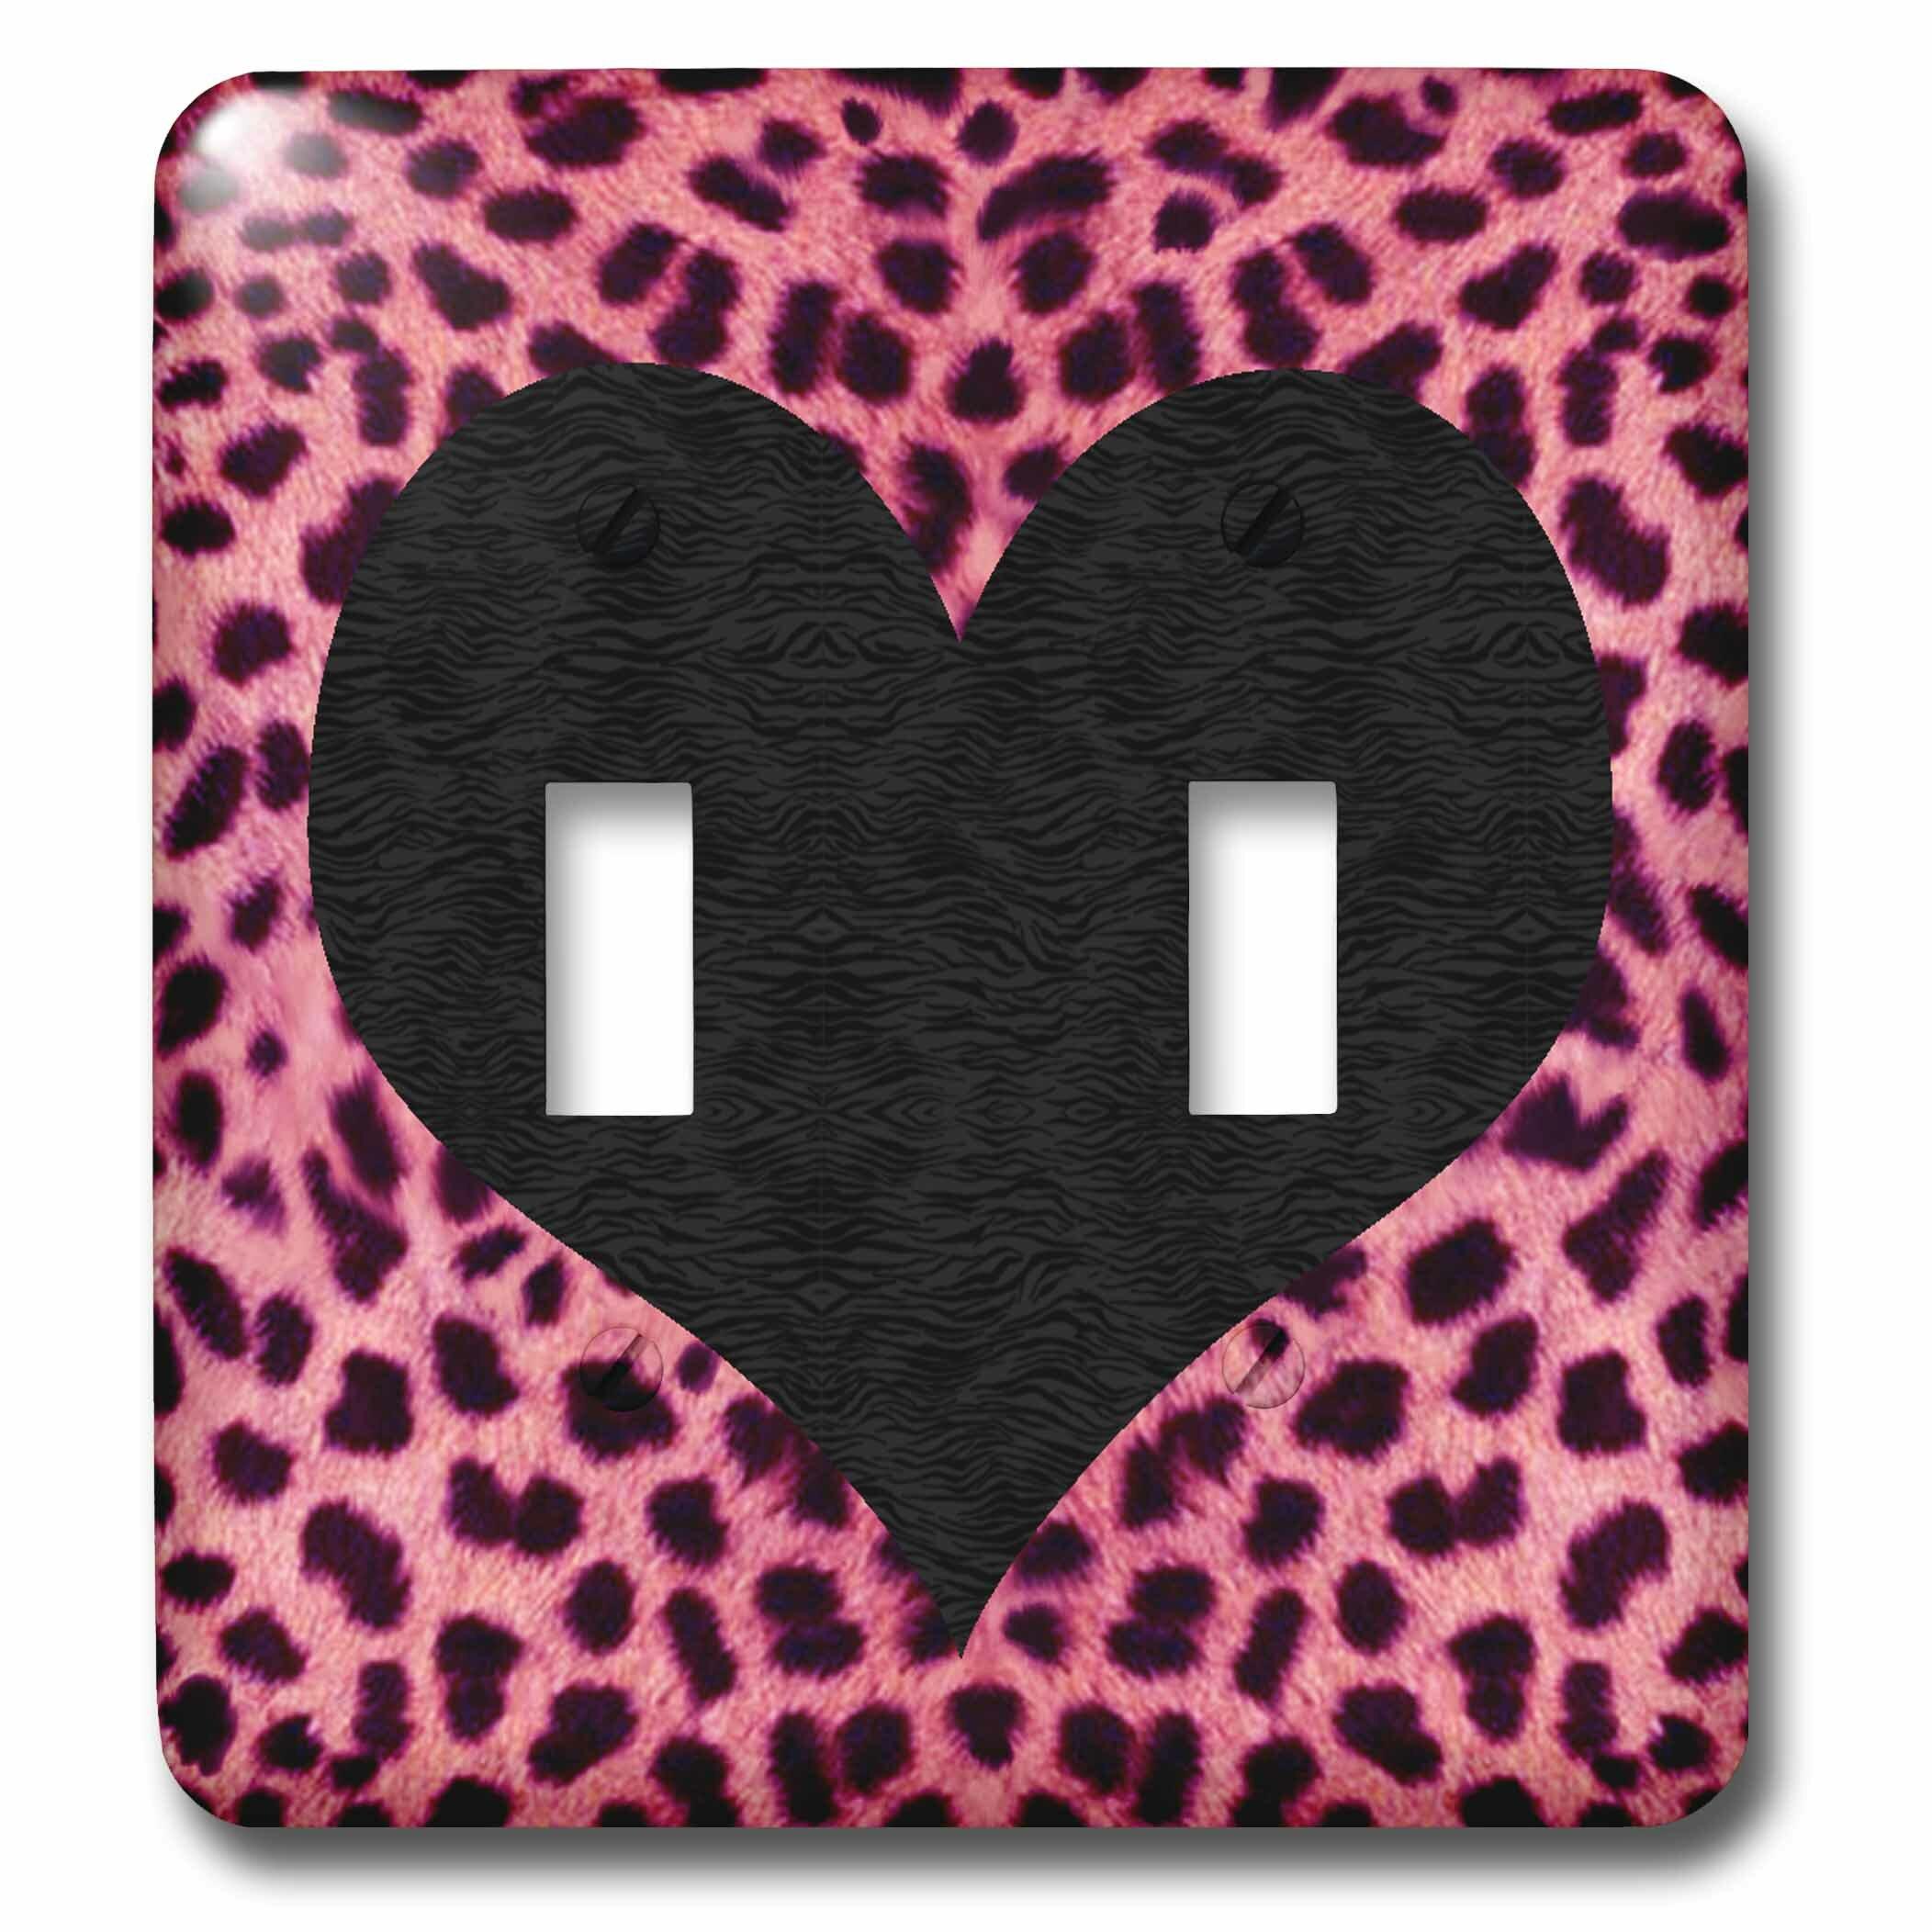 3drose Punk Rockabilly Cheetah Animal Print Heart 2 Gang Toggle Light Switch Wall Plate Wayfair